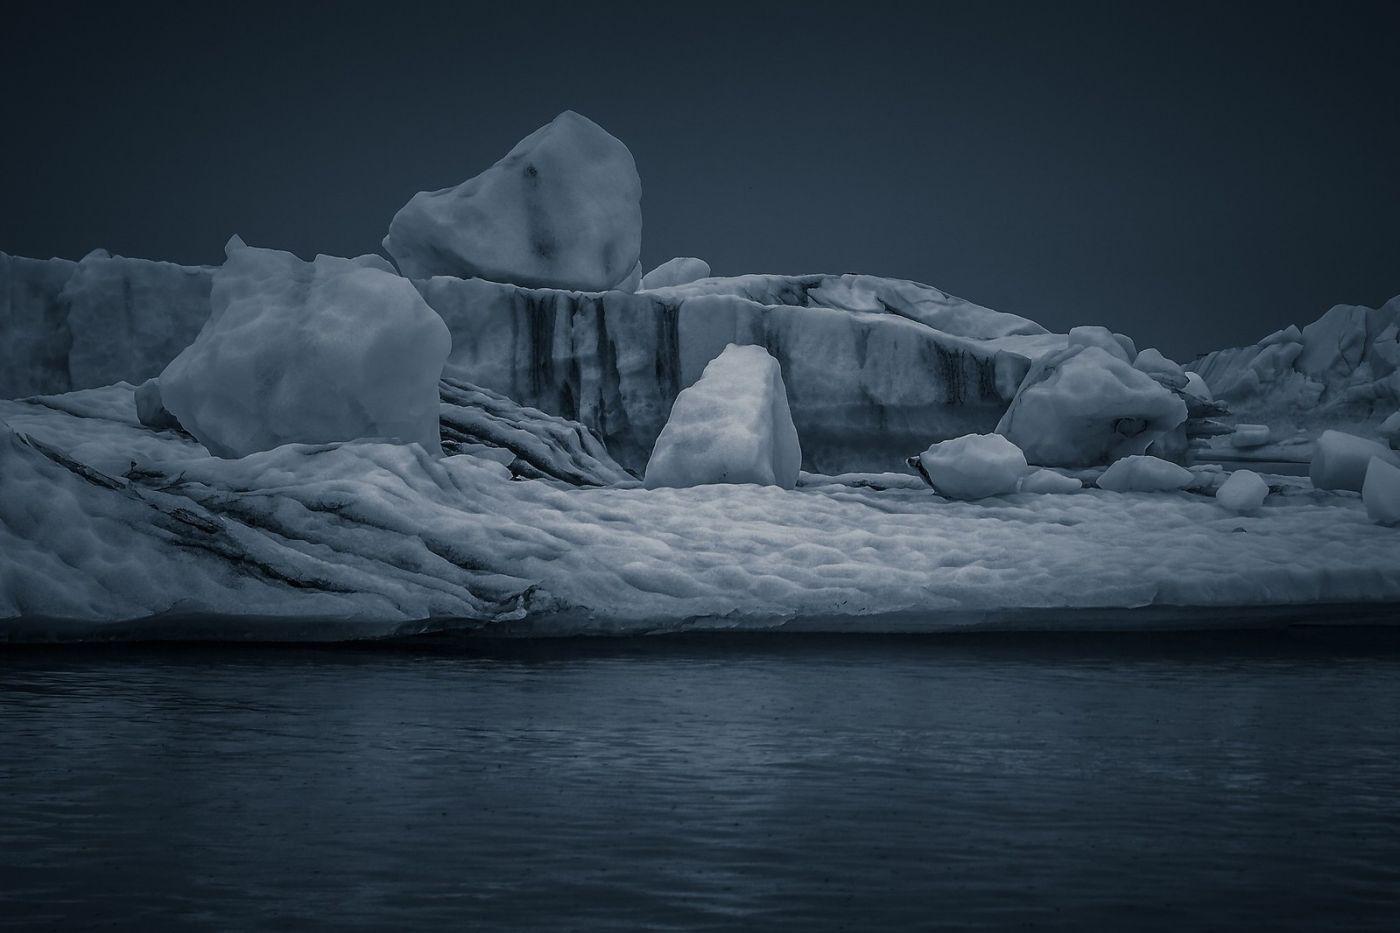 冰岛冰川泻湖(Glacier Lagoon),流动的冰川_图1-17